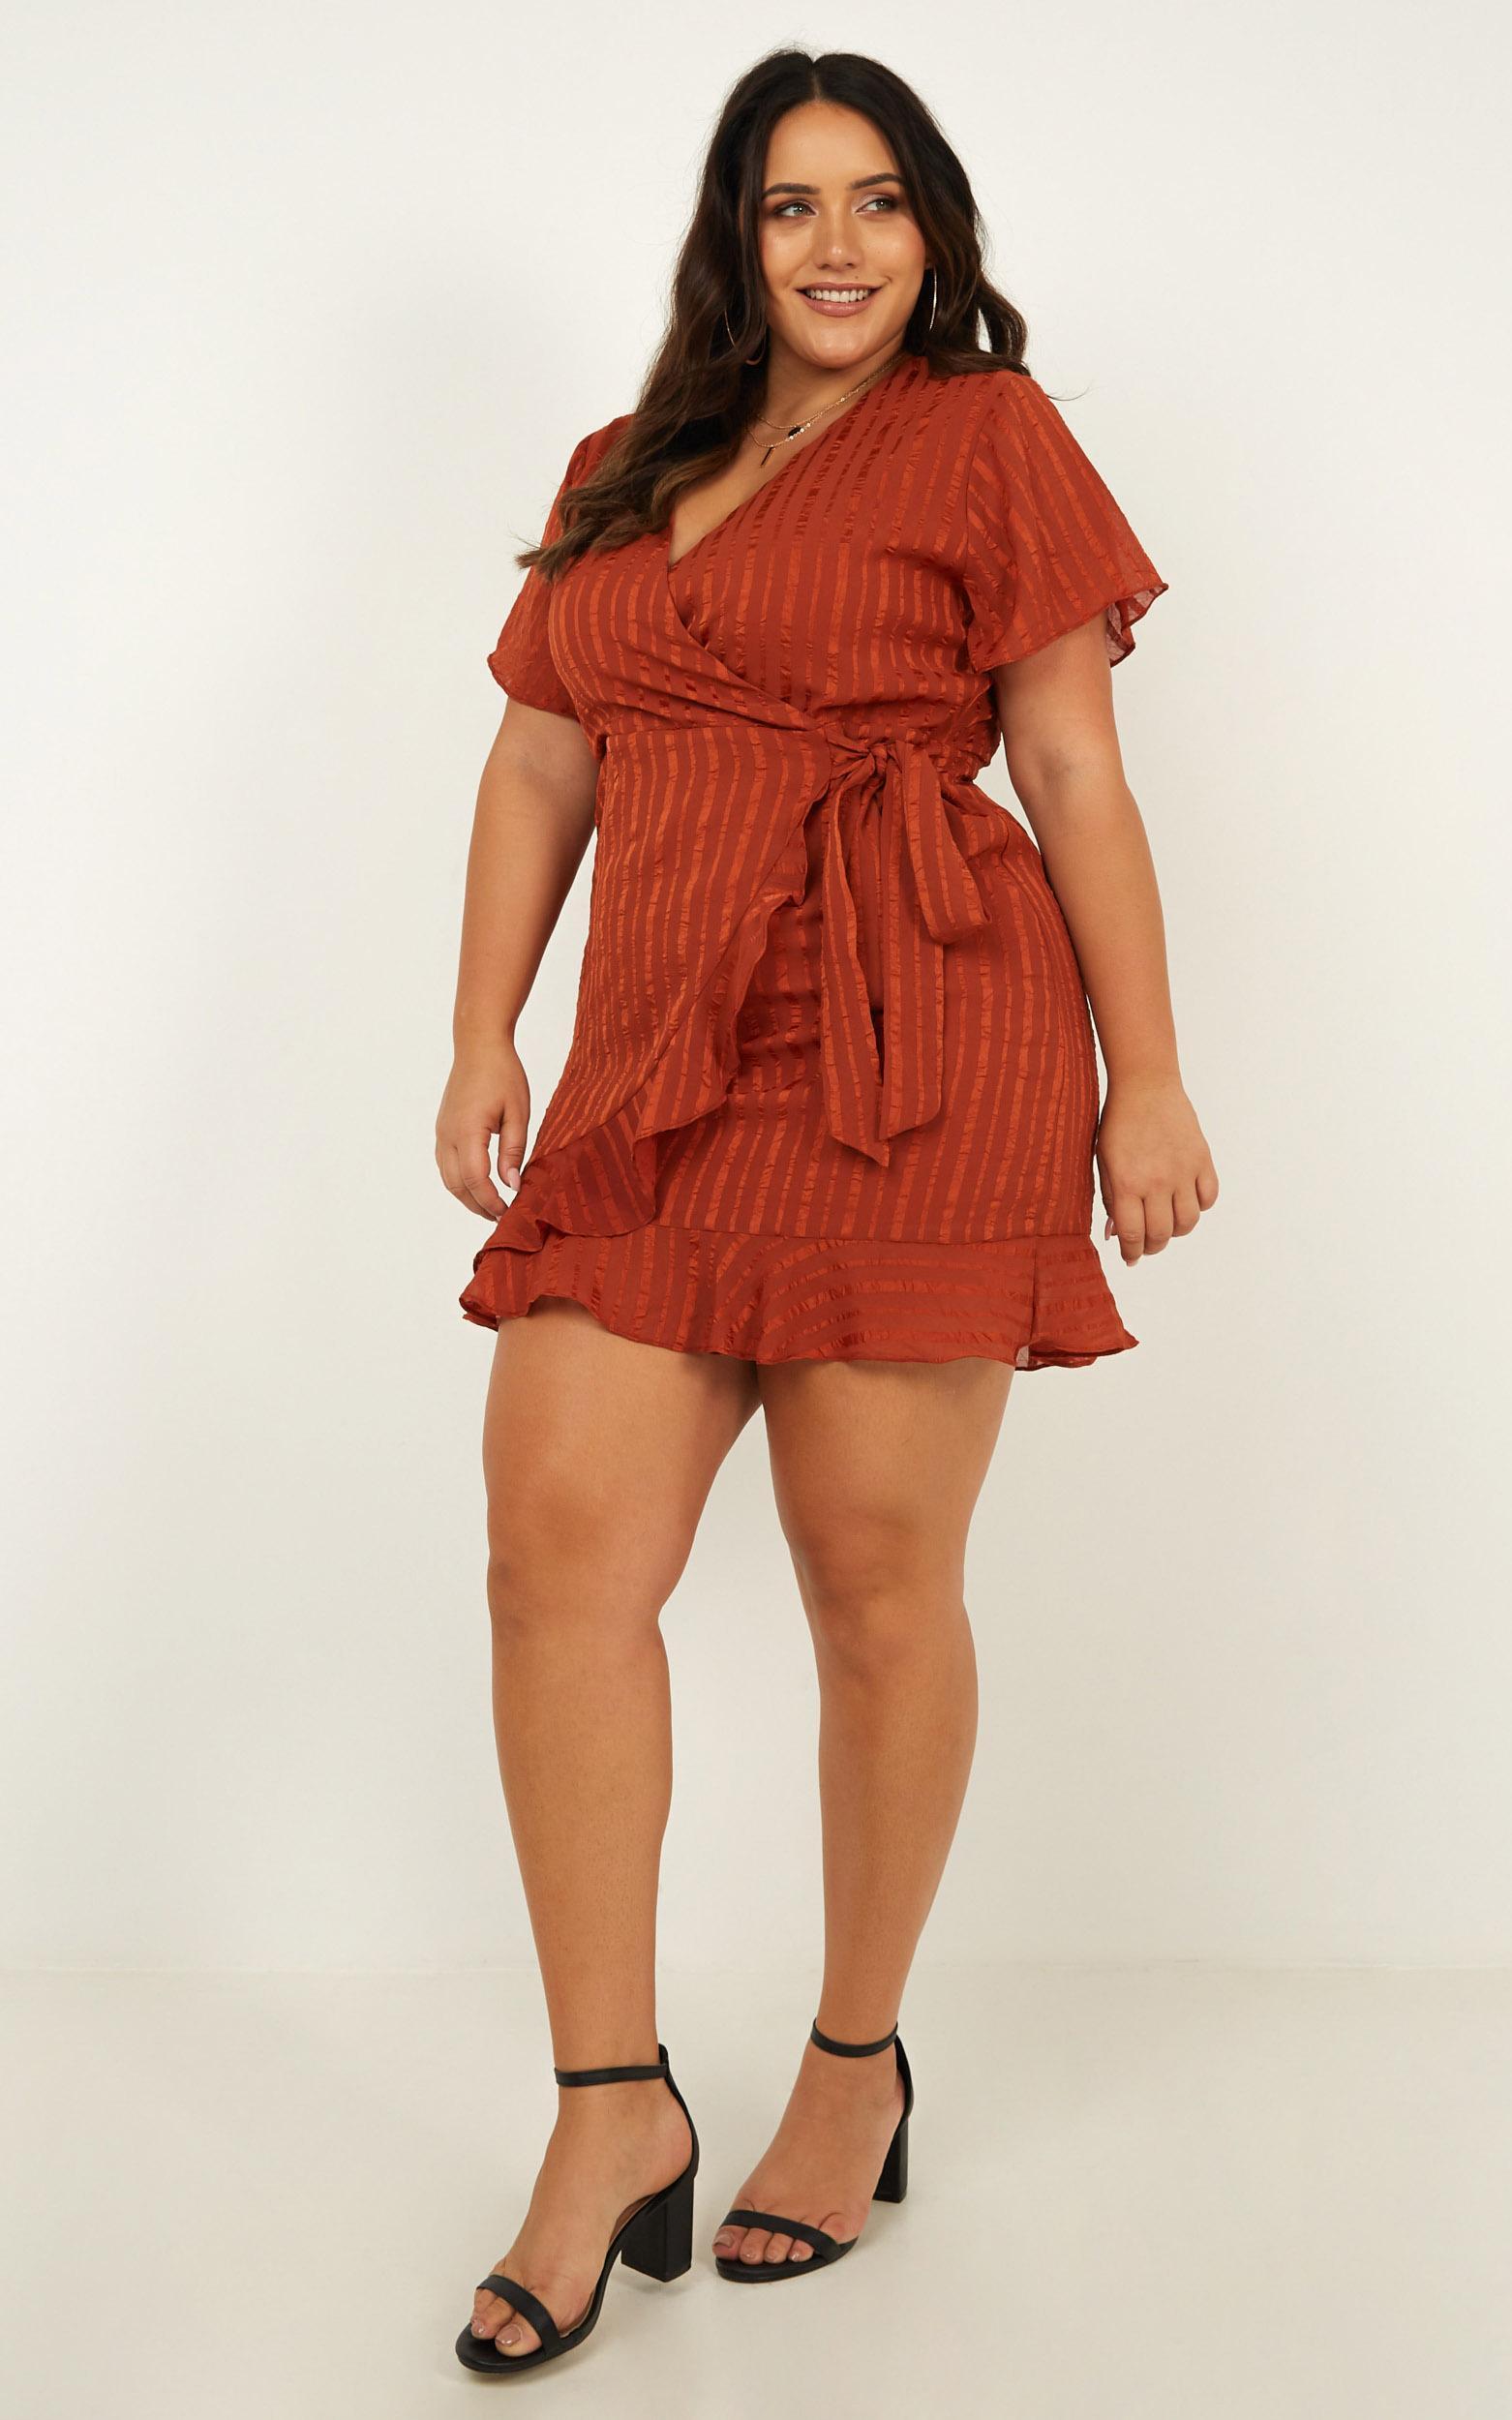 Chic alternative Dress in rust - 12 (L), Rust, hi-res image number null